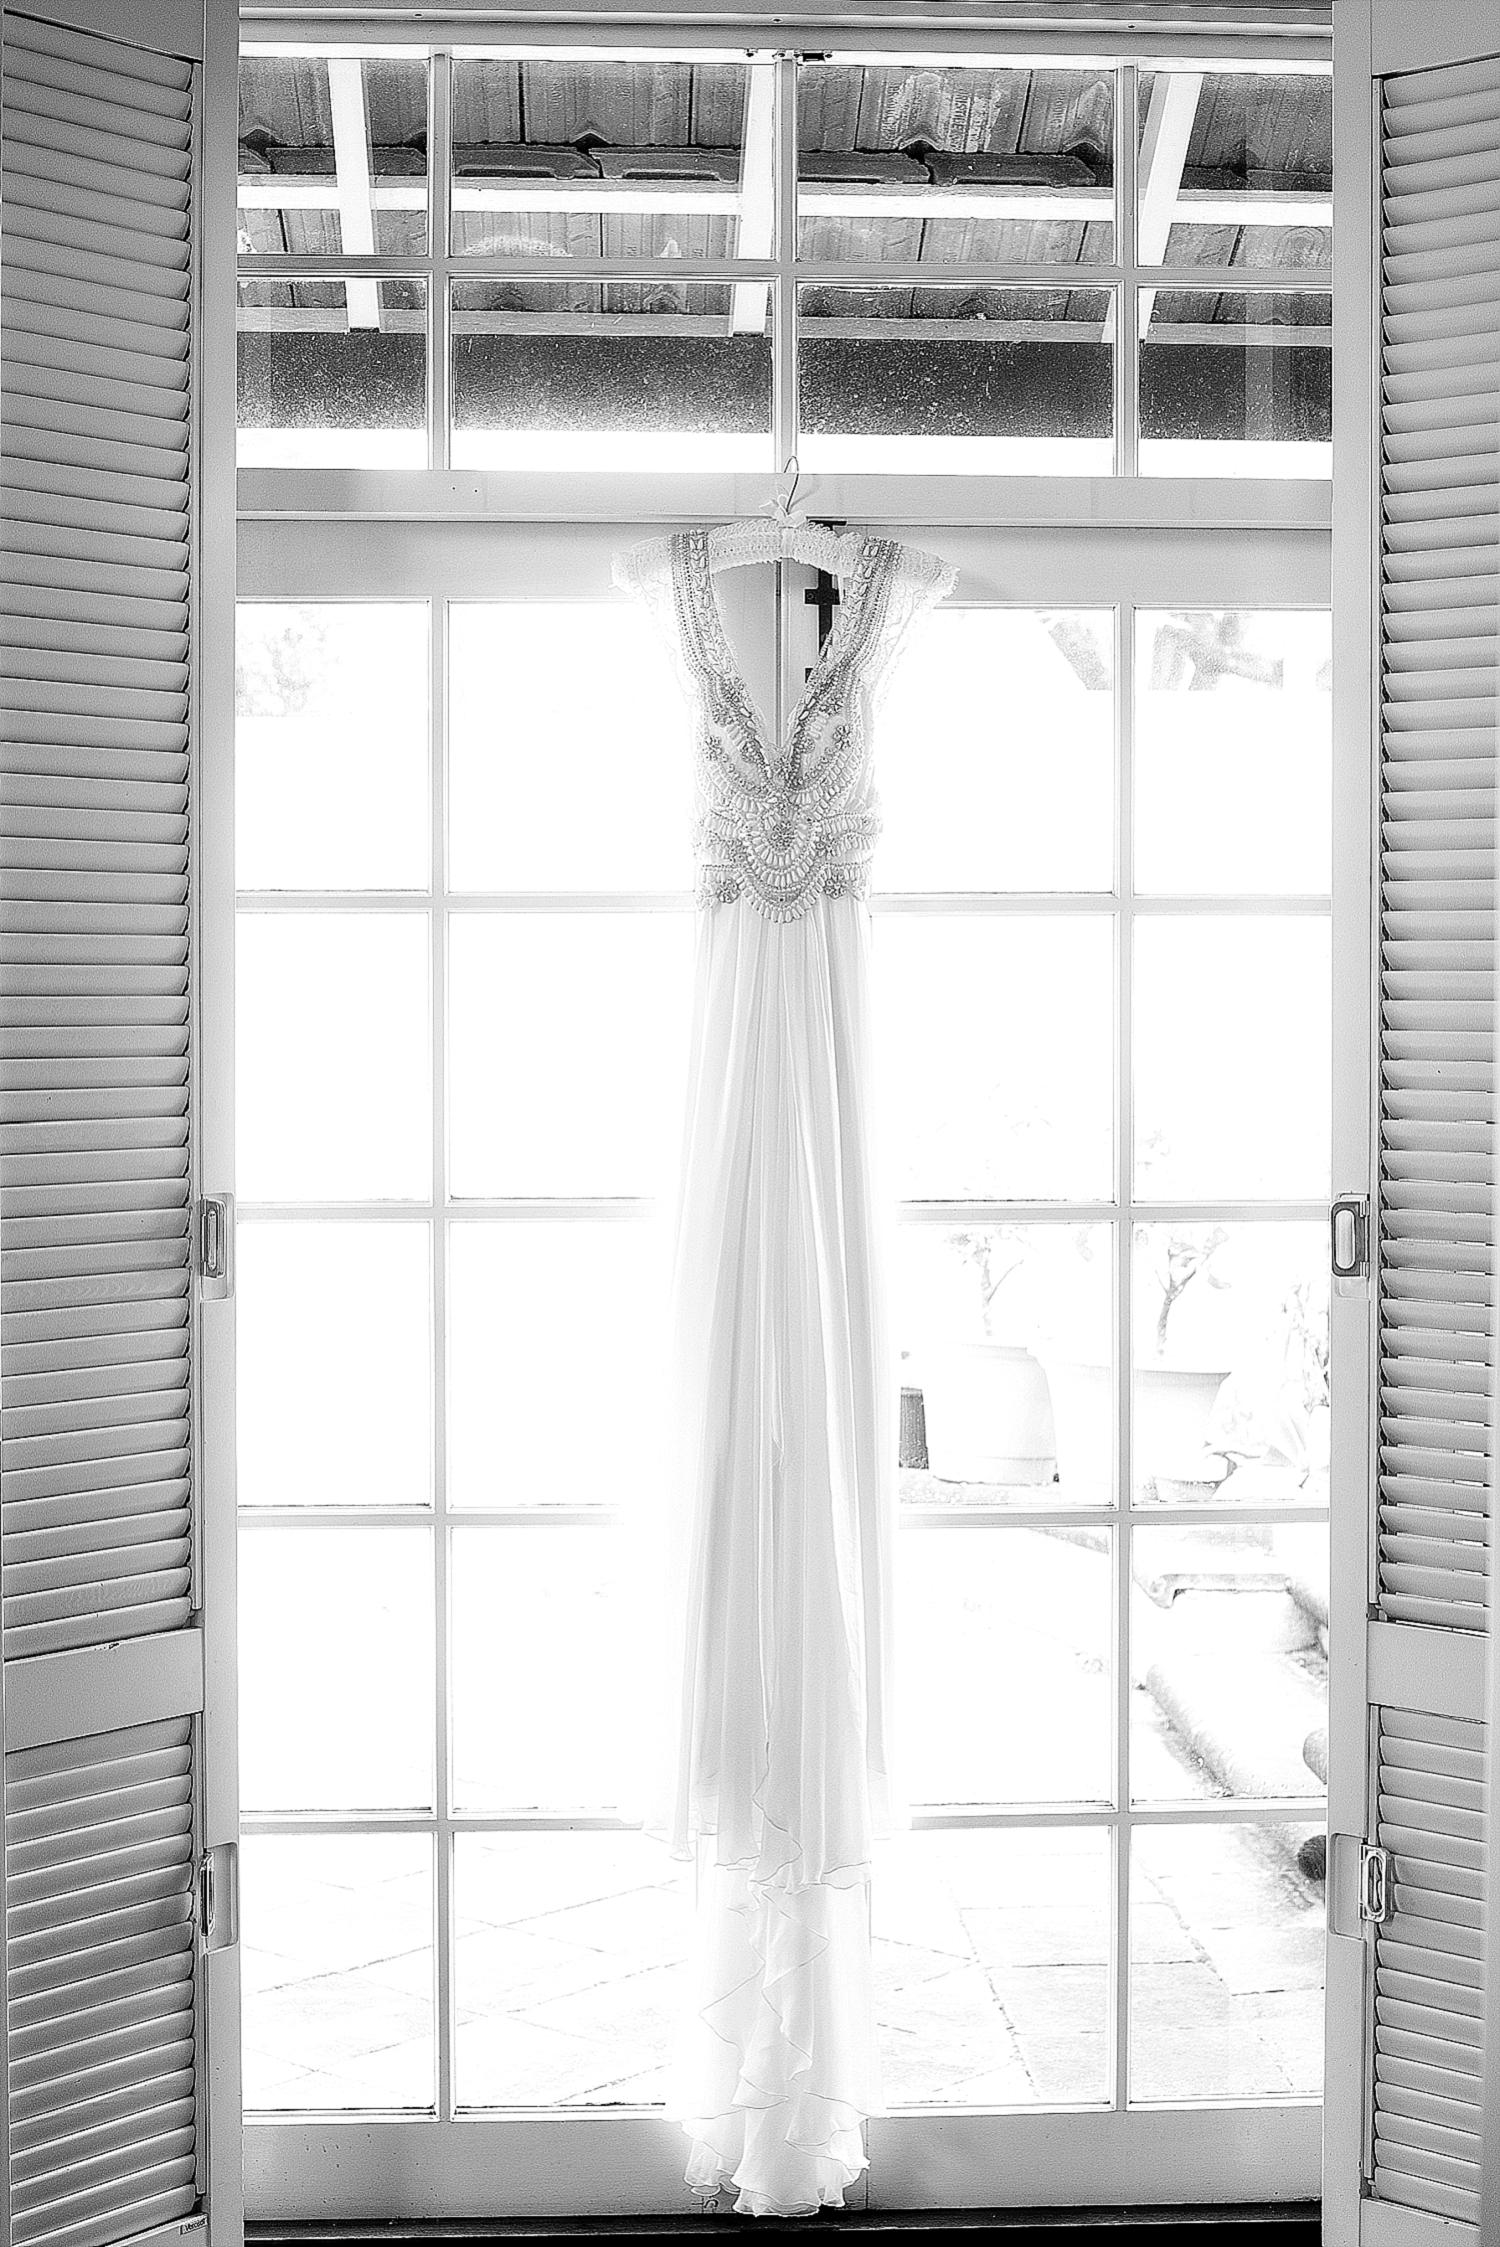 32_perth wedding photographers deray and simcoe.jpg